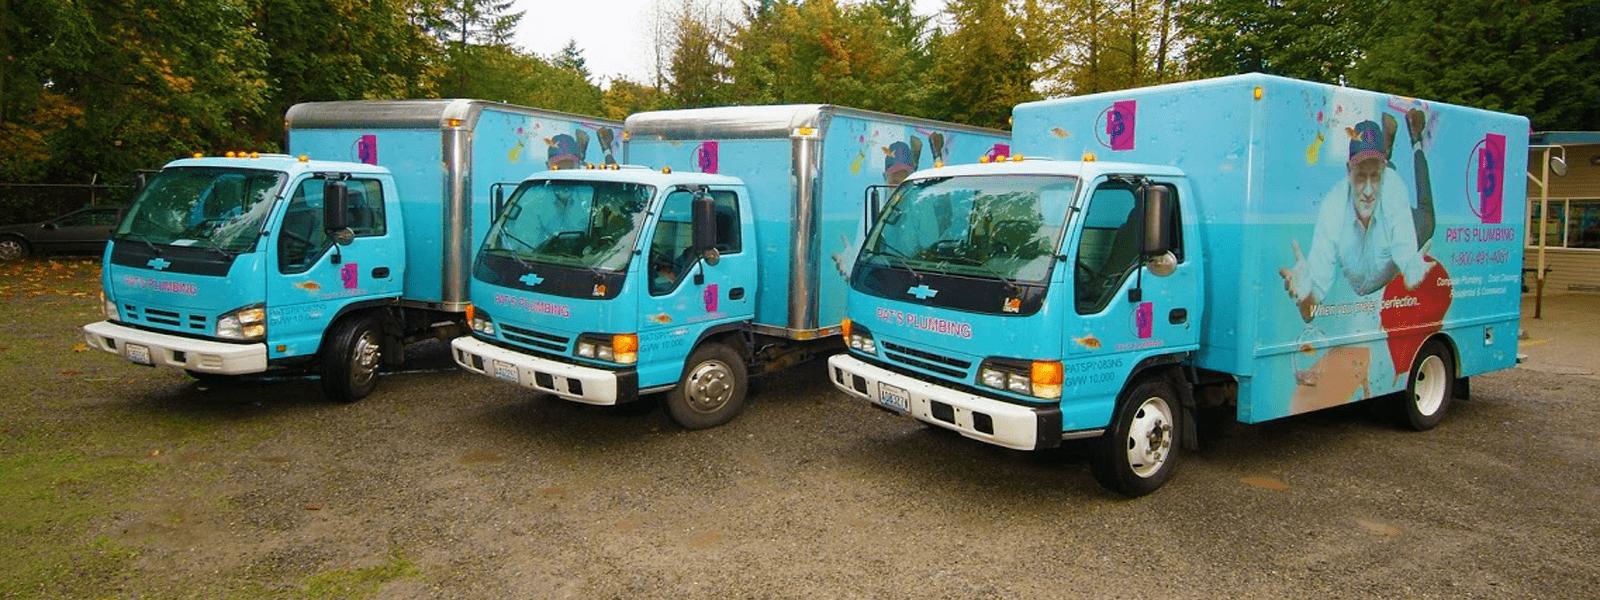 Pat's Trucks